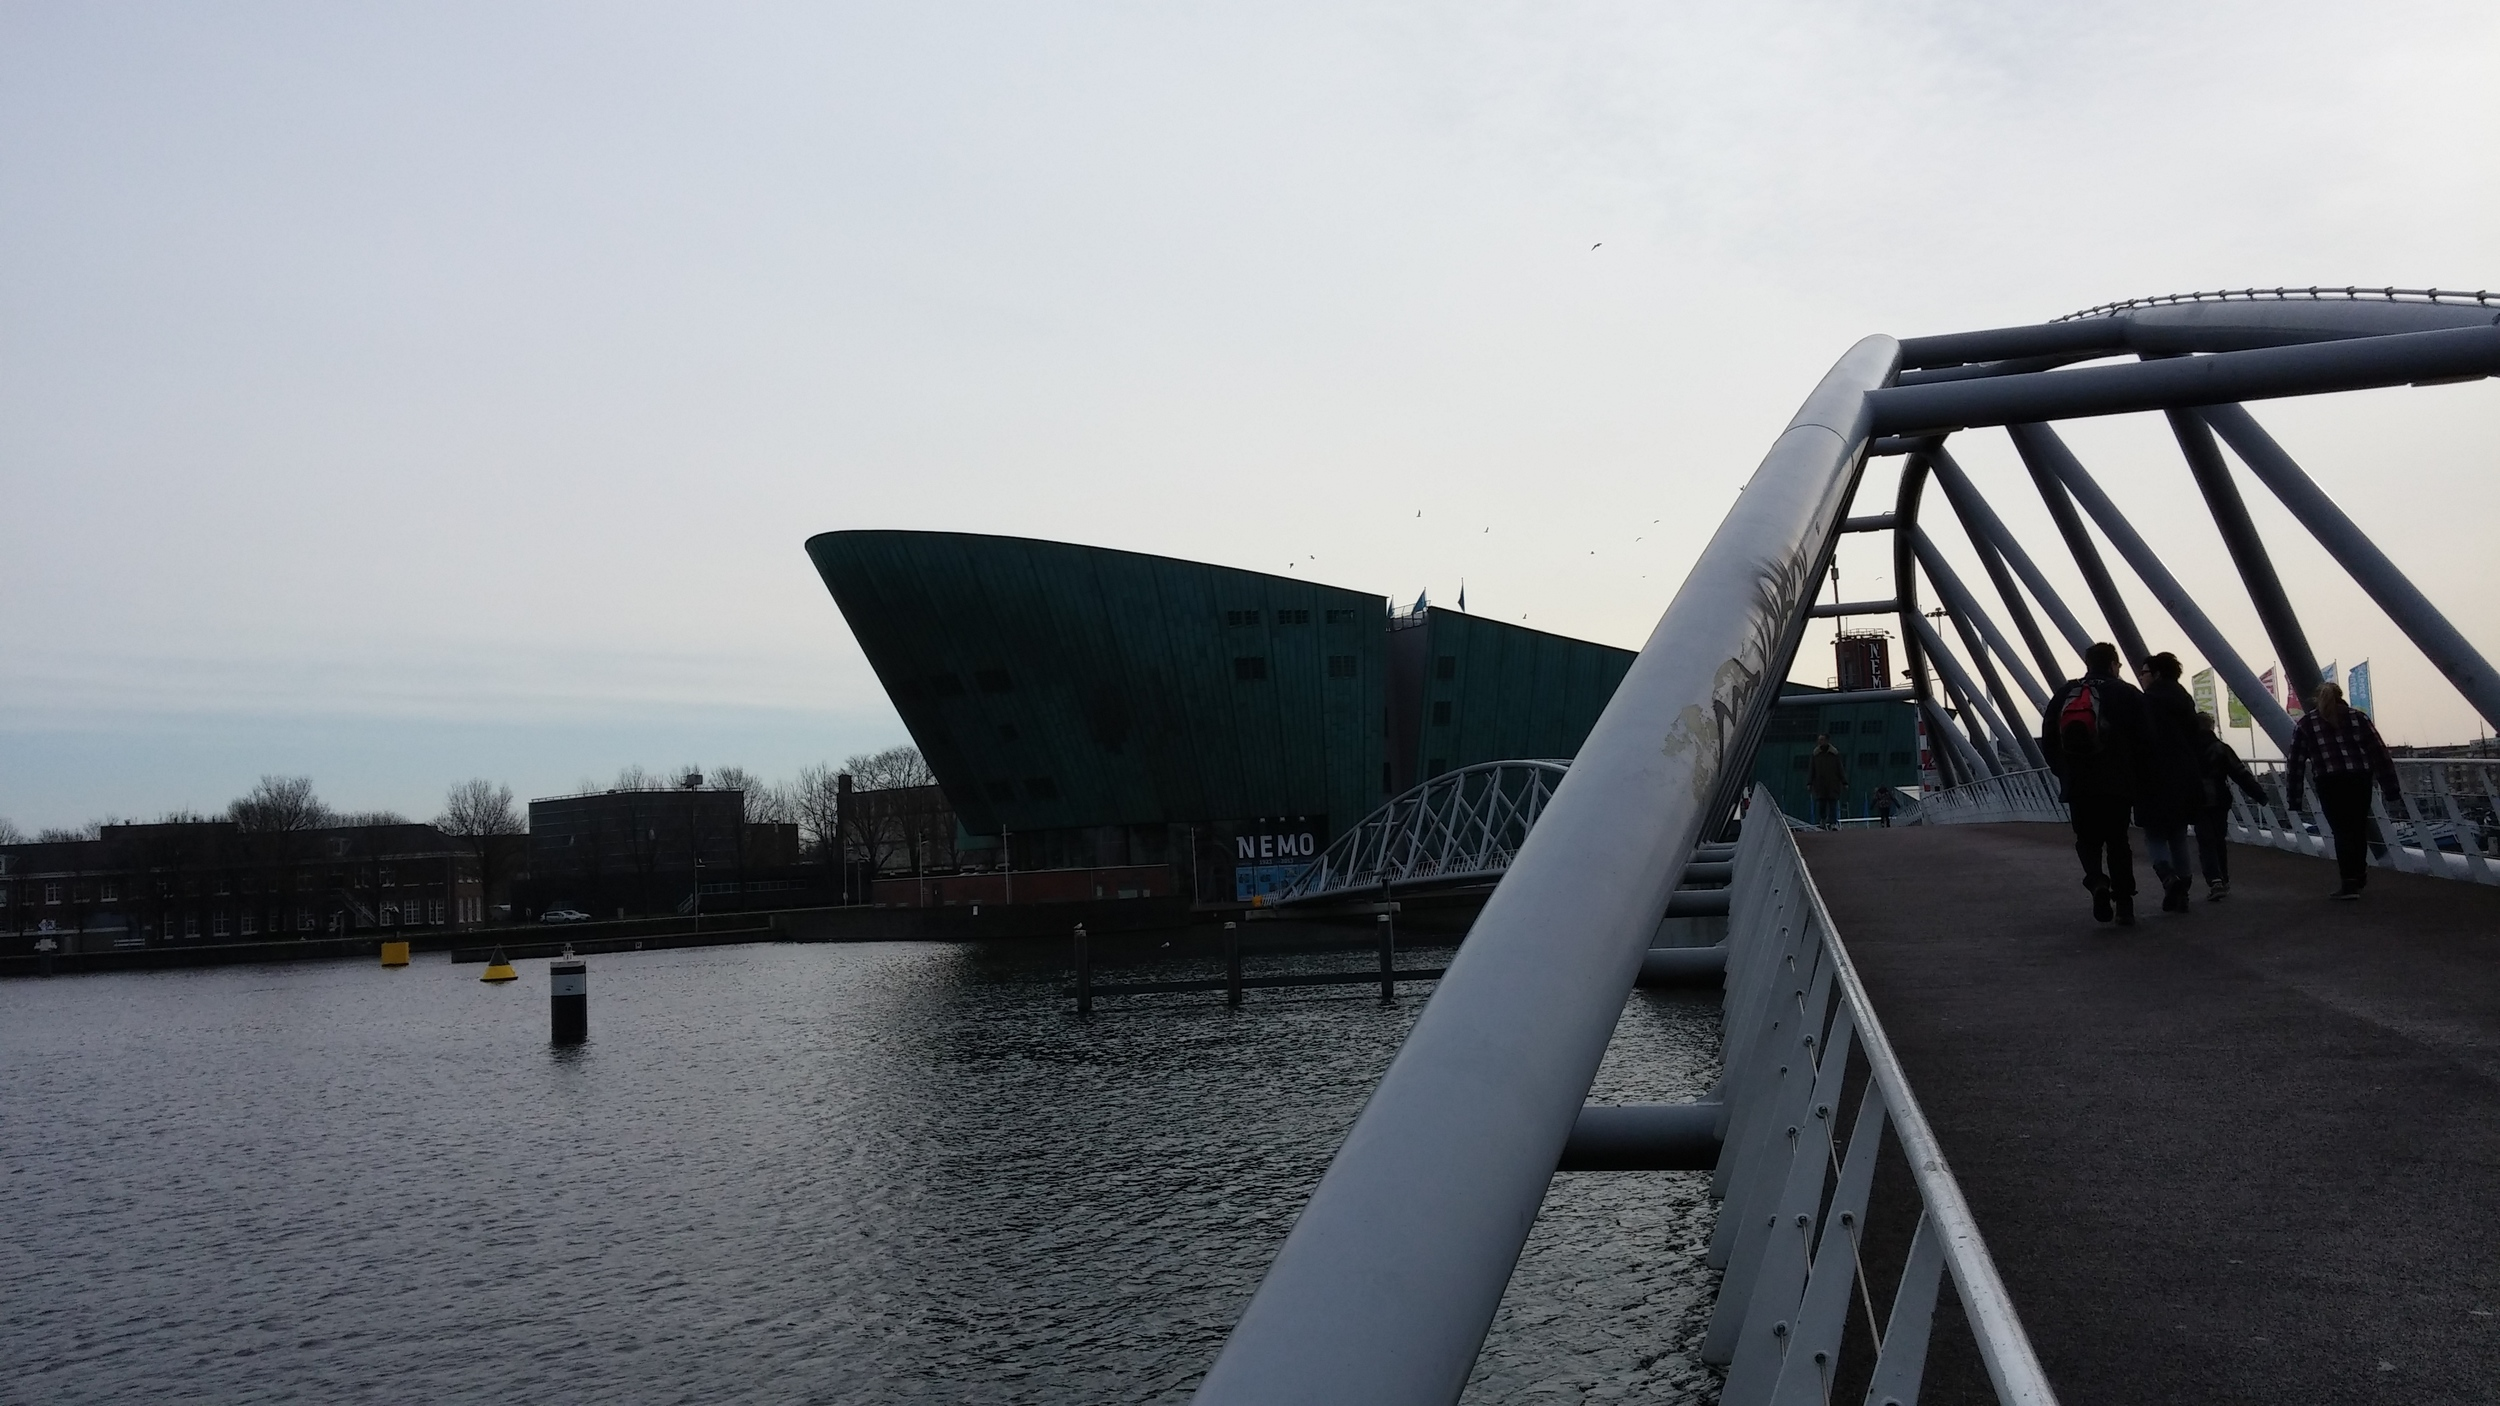 NEMO science museum. It looks like a ship.